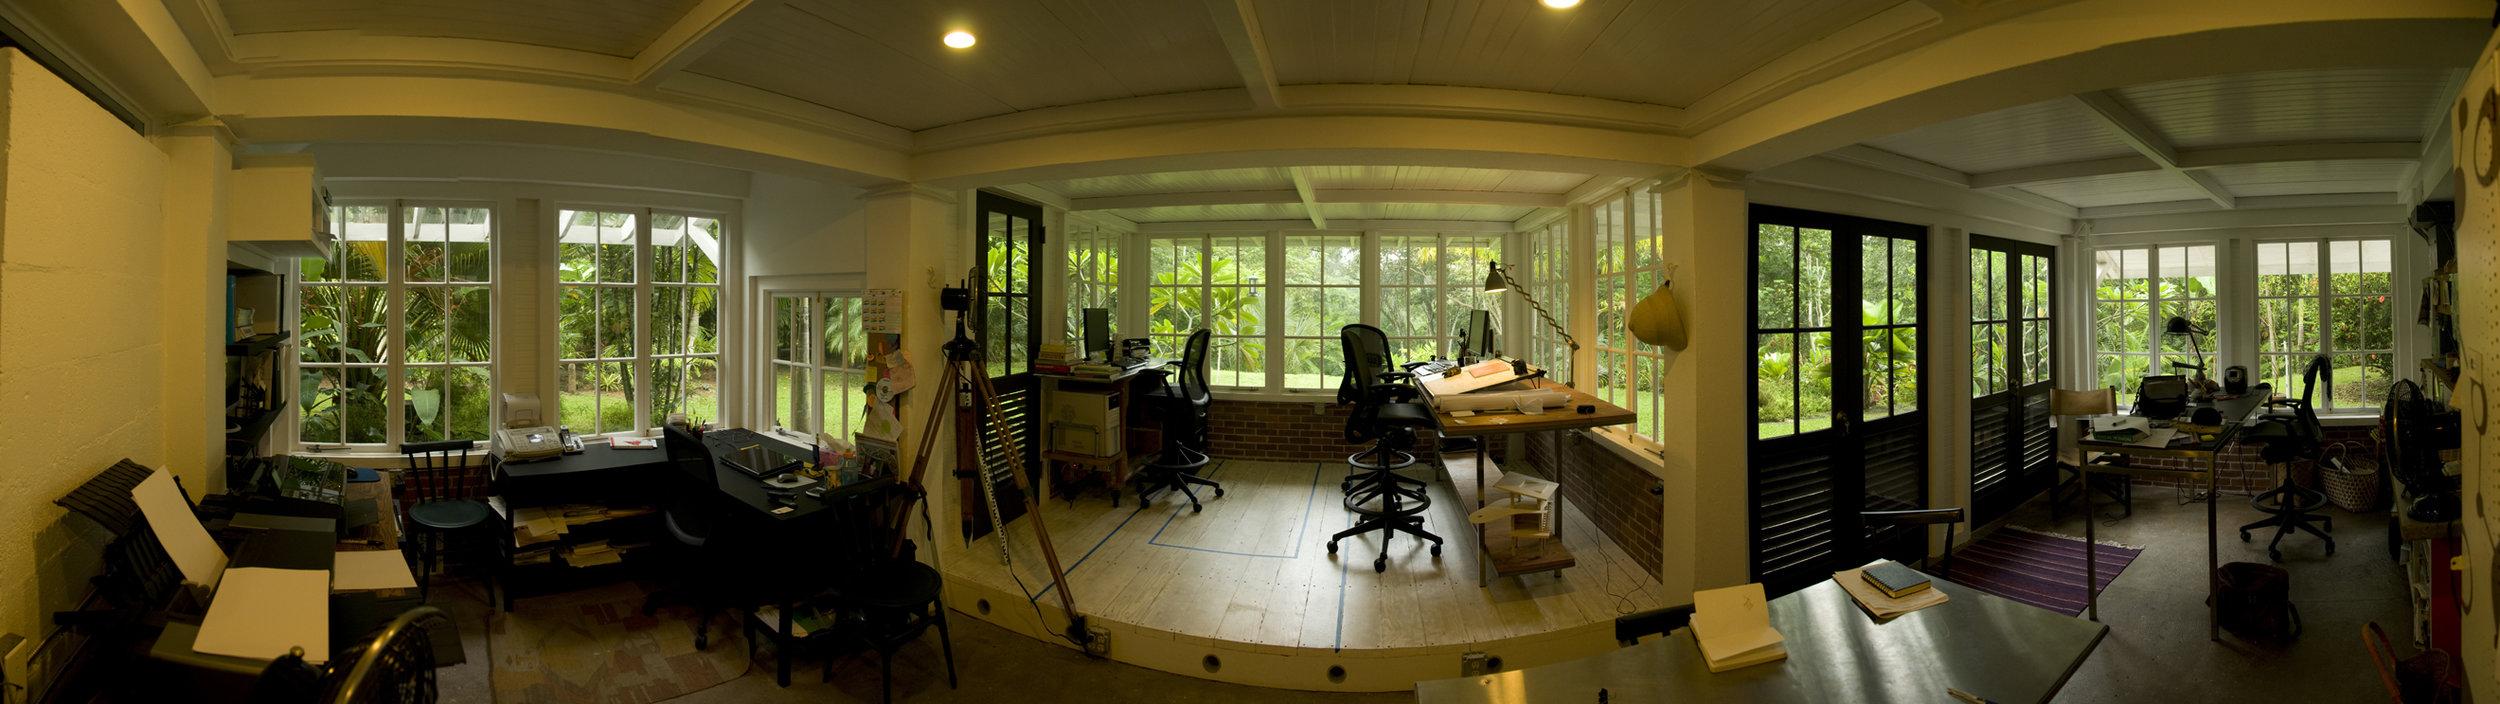 office stitch small.jpg